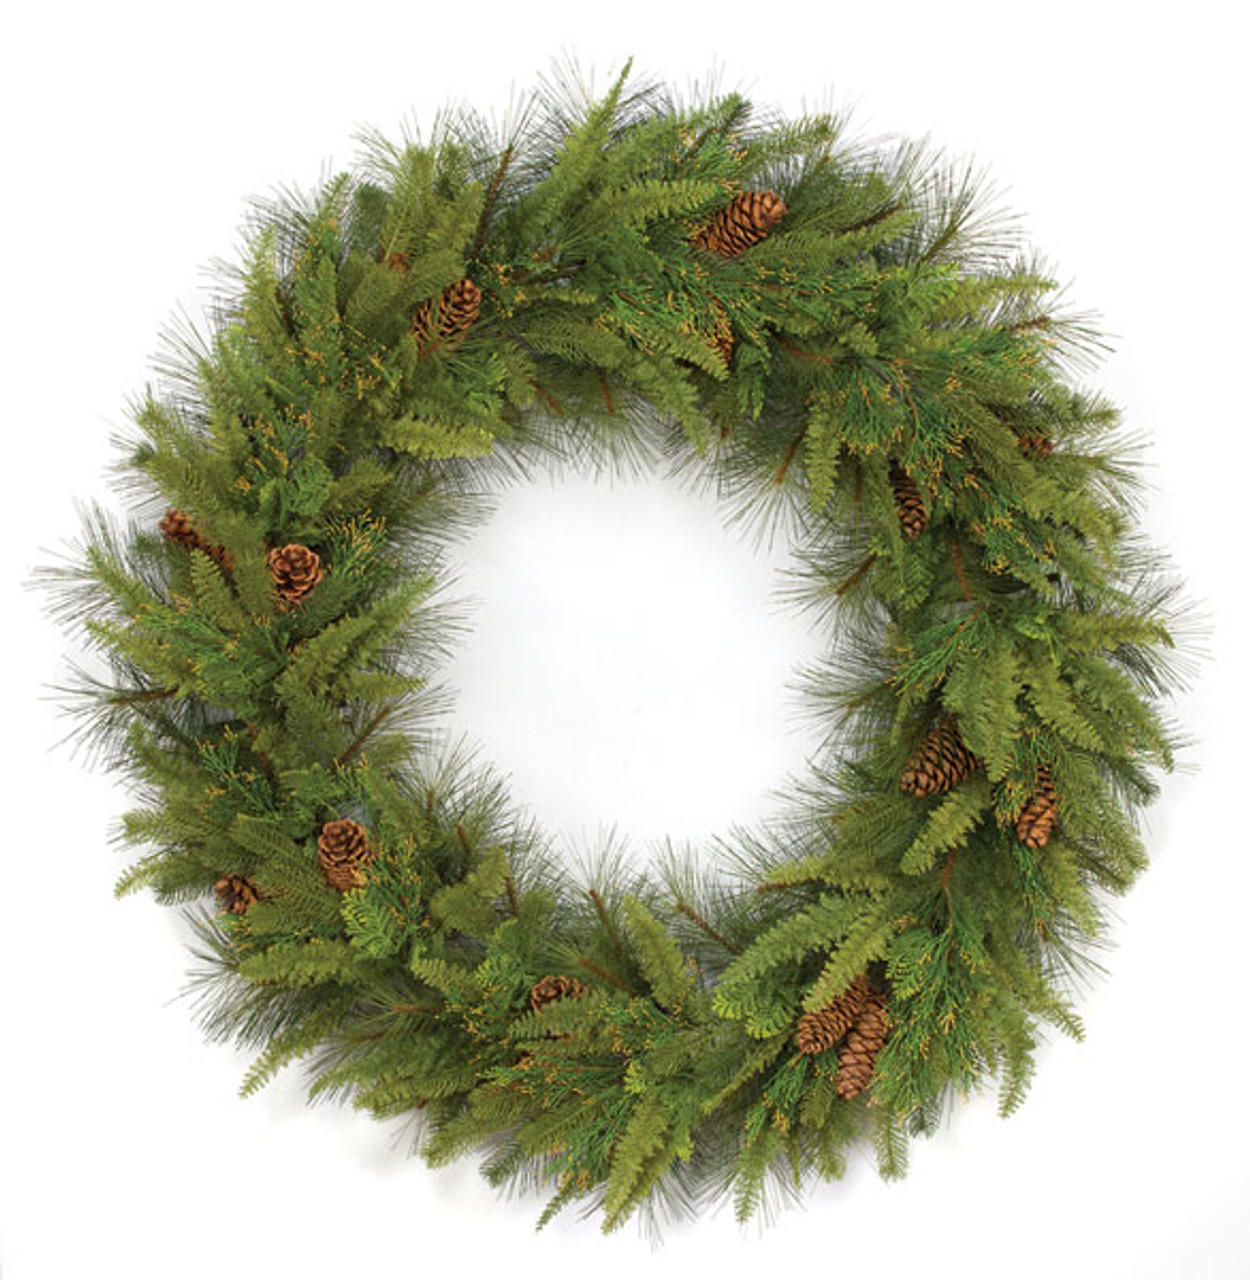 60 mixed pine fold a way wreath pepvc tips pine